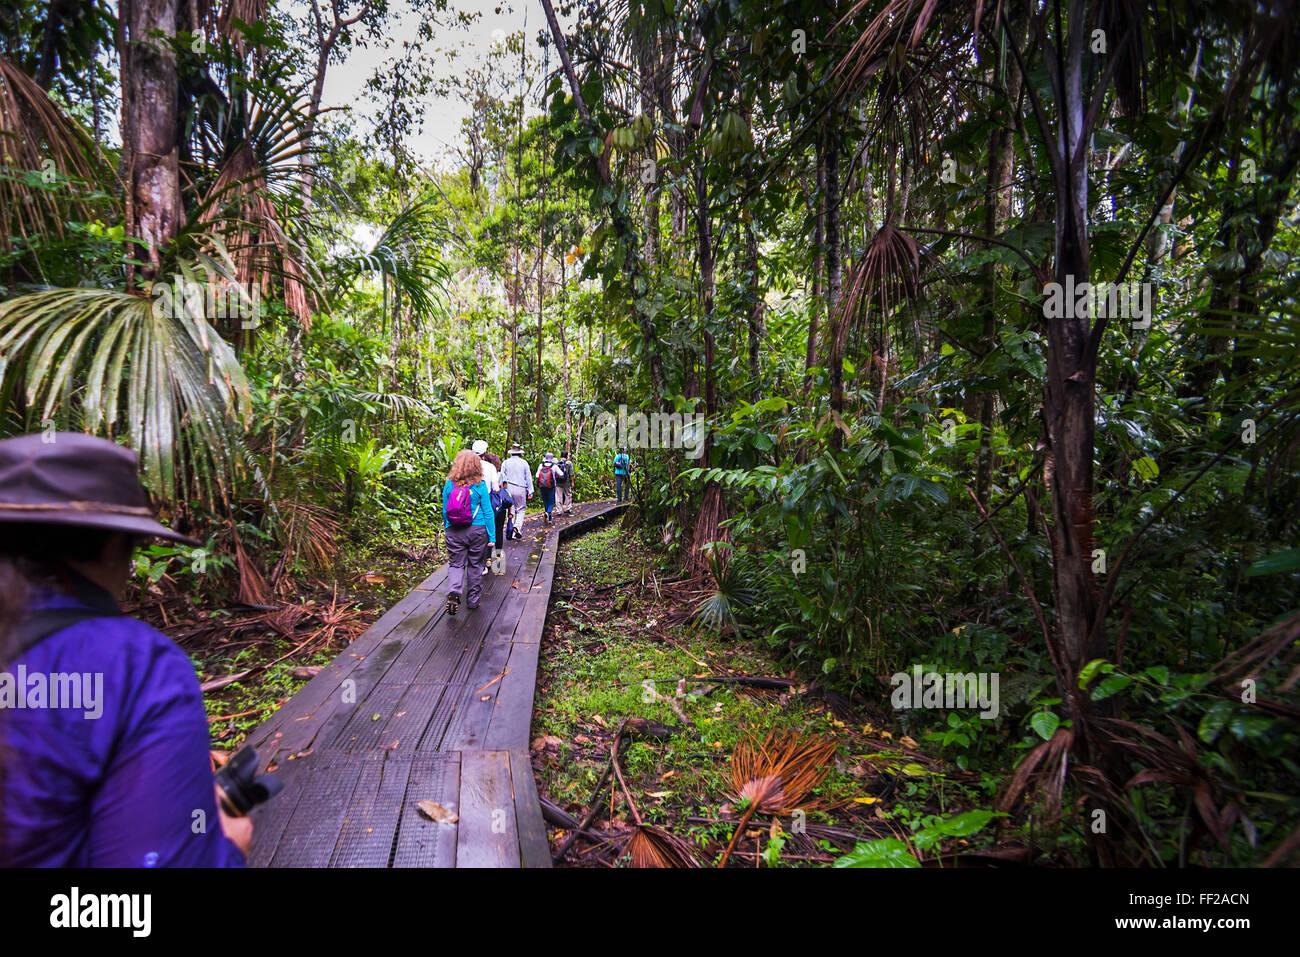 En la Selva Amazónica WaRMking en Sacha RModge, Coca, Ecuador, Sudamérica Imagen De Stock